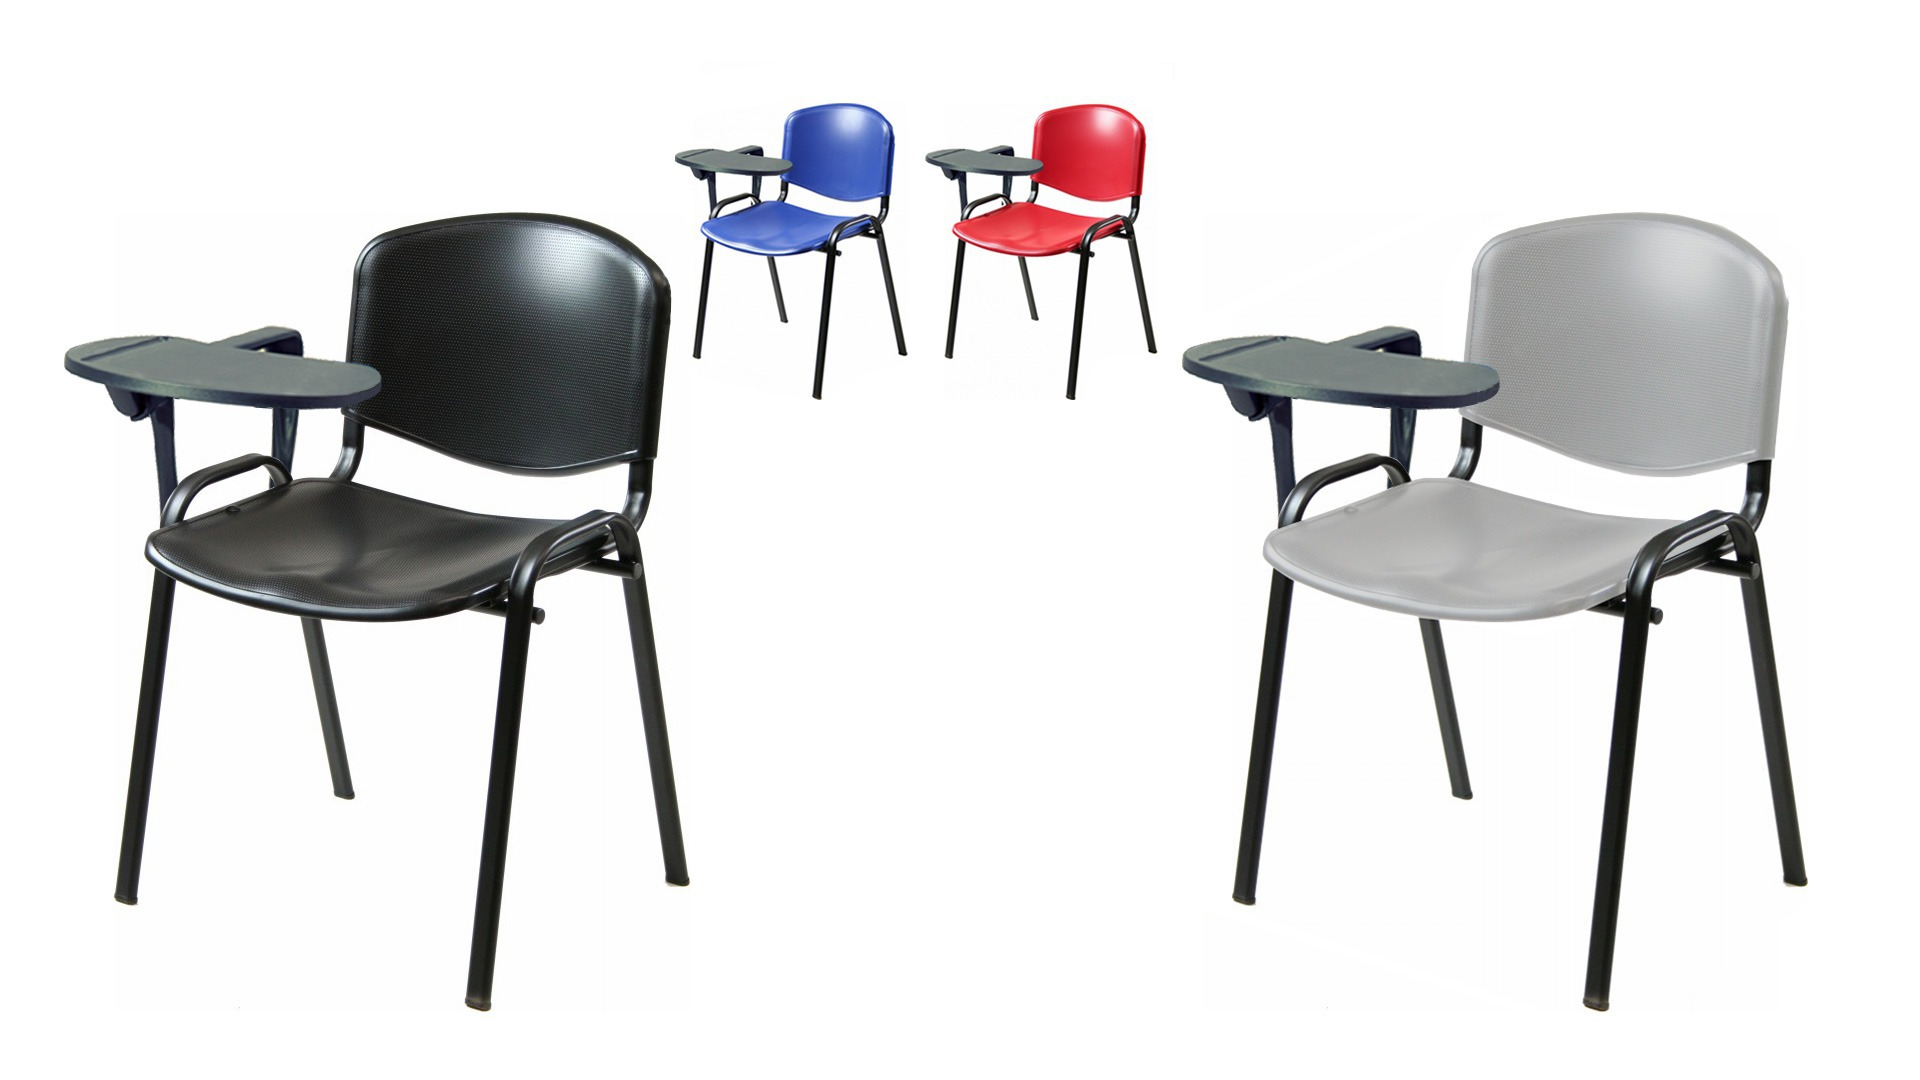 Ecops accktda poltrone sedie ufficio da 40 92 fumustore for Sedie compra online